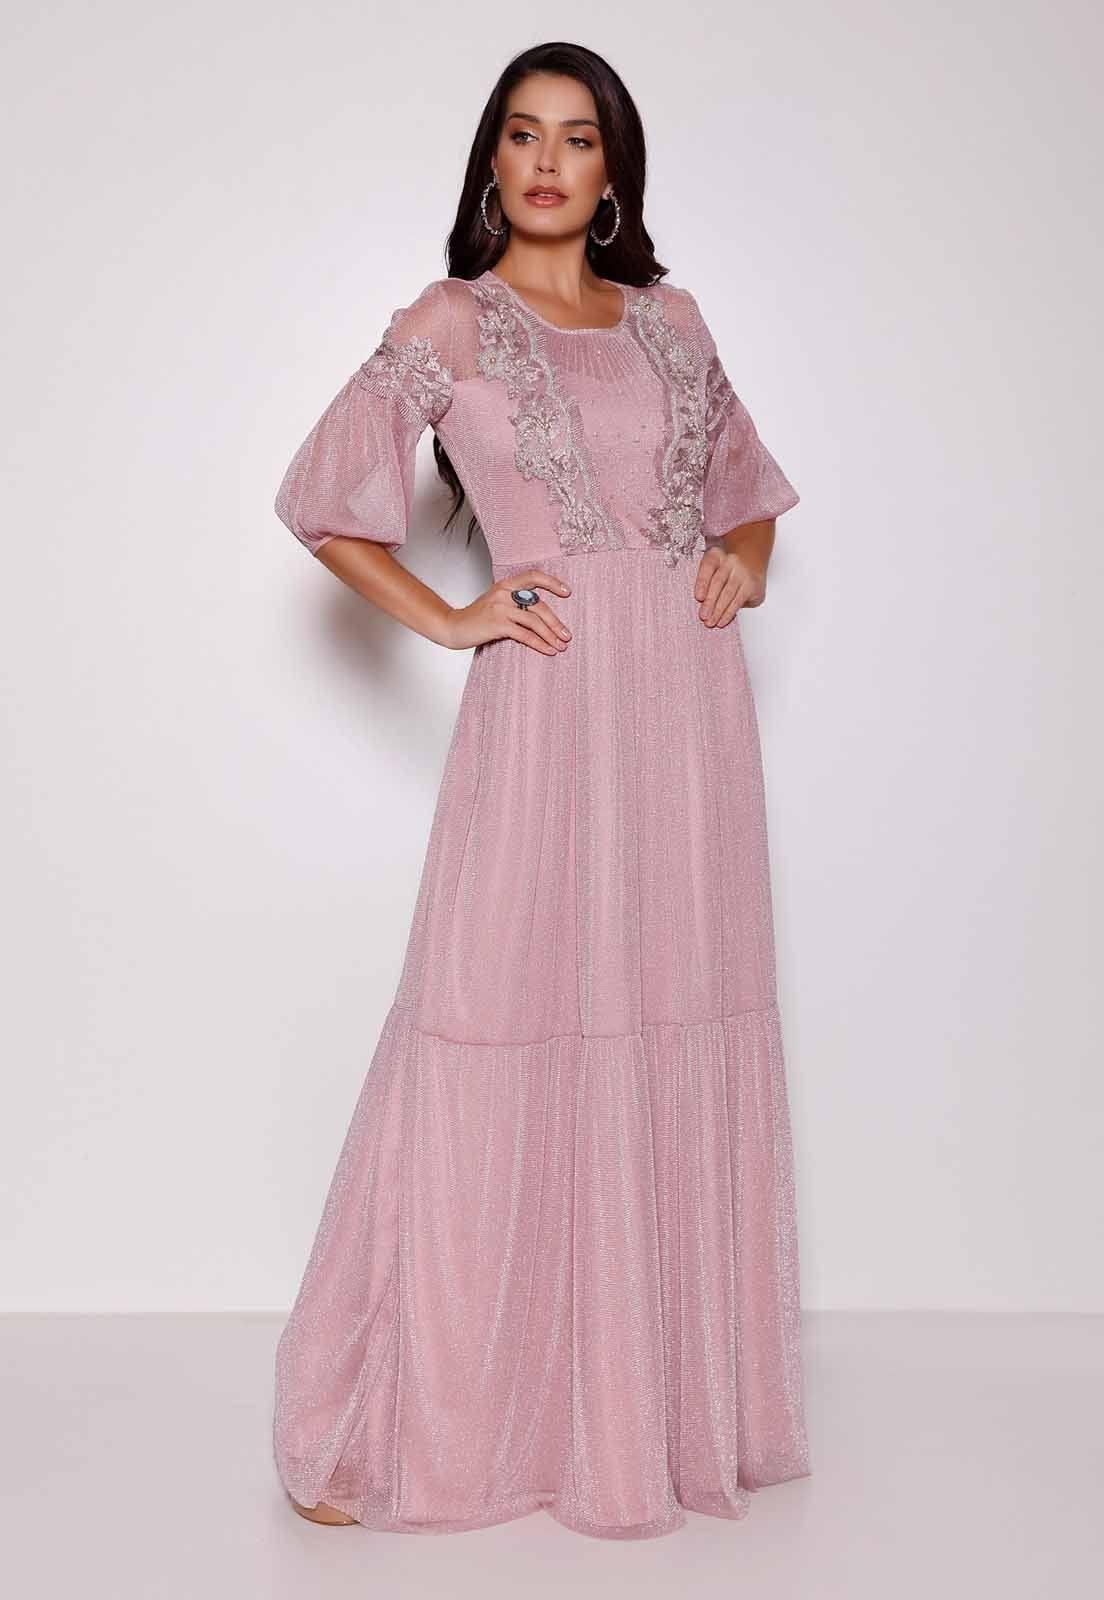 Vestido Longo Fasciniu's Bordado Moda Evangelica 2020